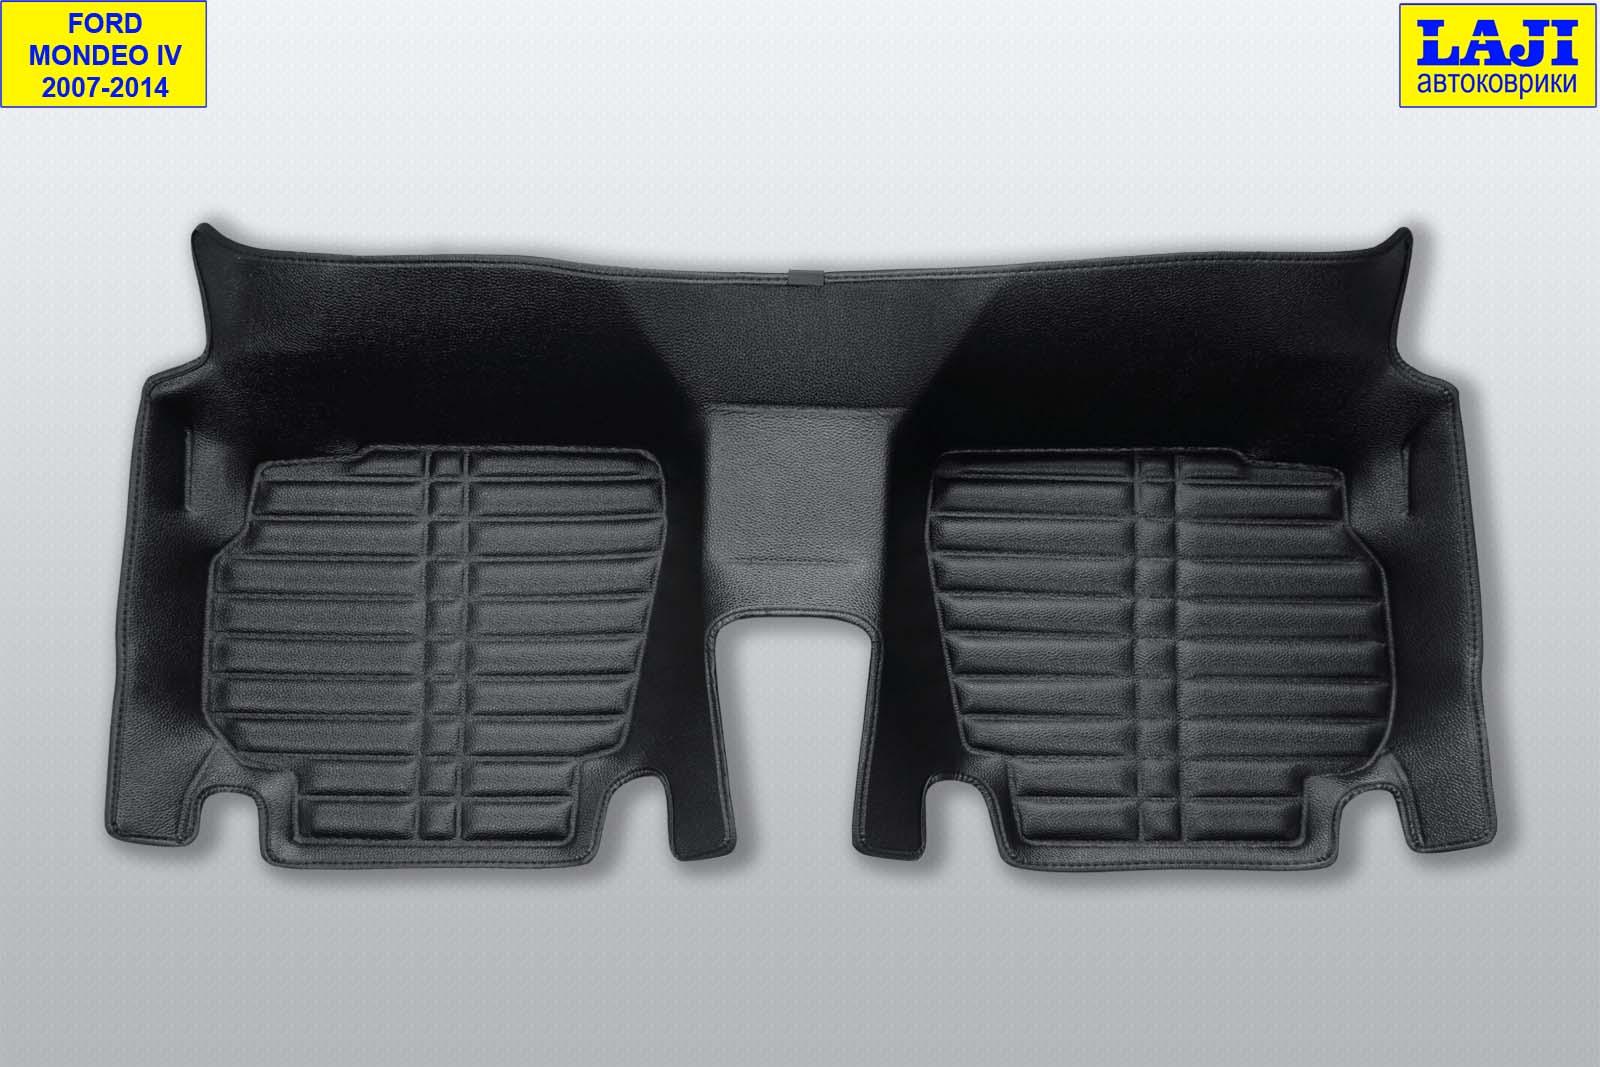 5D коврики в салон Ford Mondeo 4 2007-2014 9